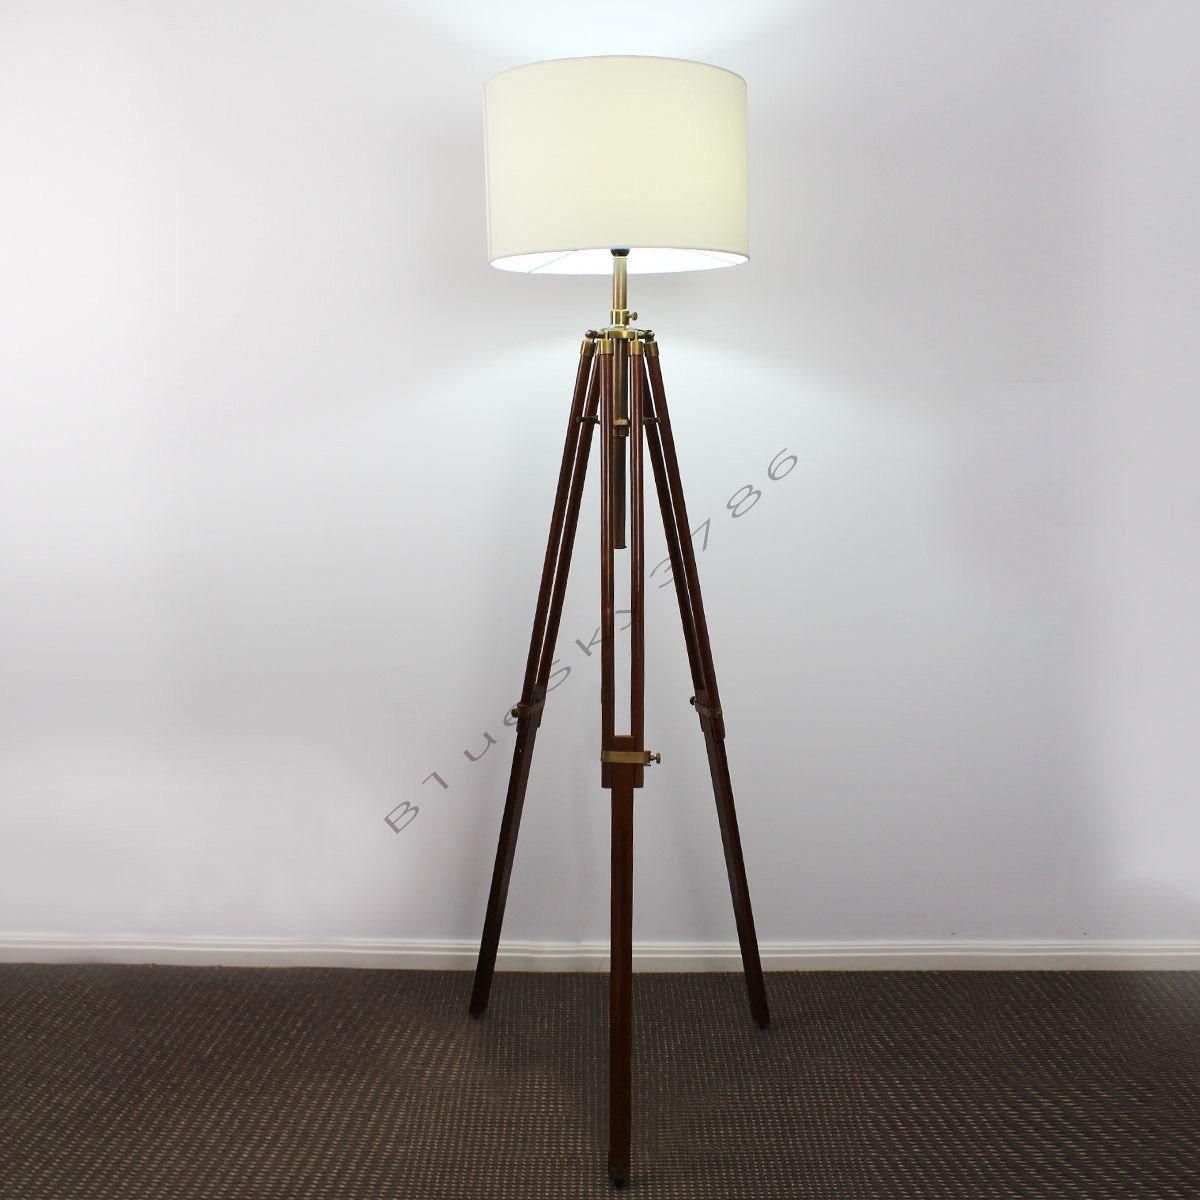 Teak timber nautical tripod floor lamp wood by bluesky3786 for Wooden floor lamp etsy